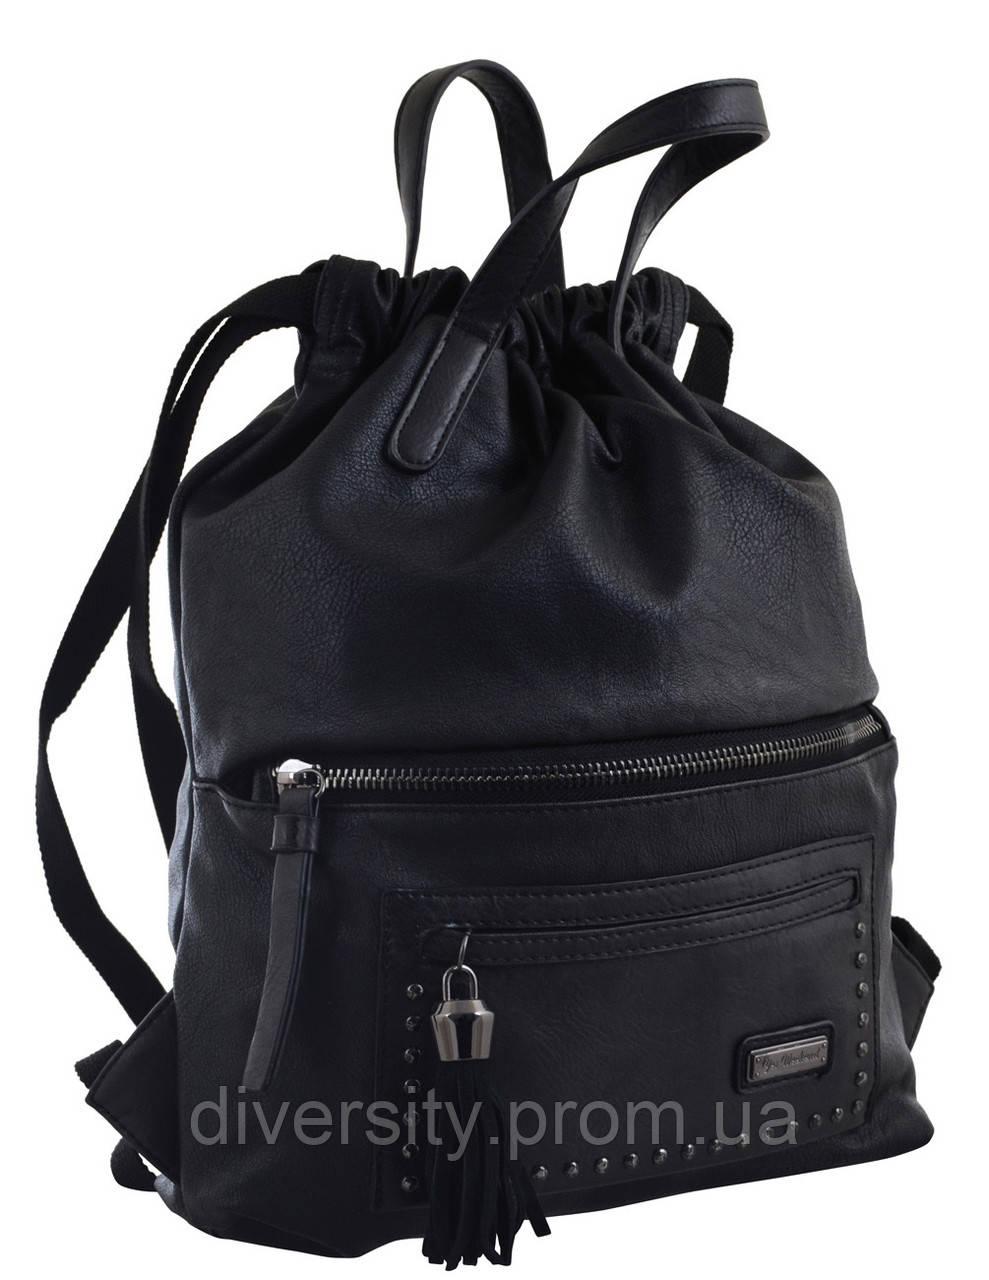 Женский рюкзак YES YW-11